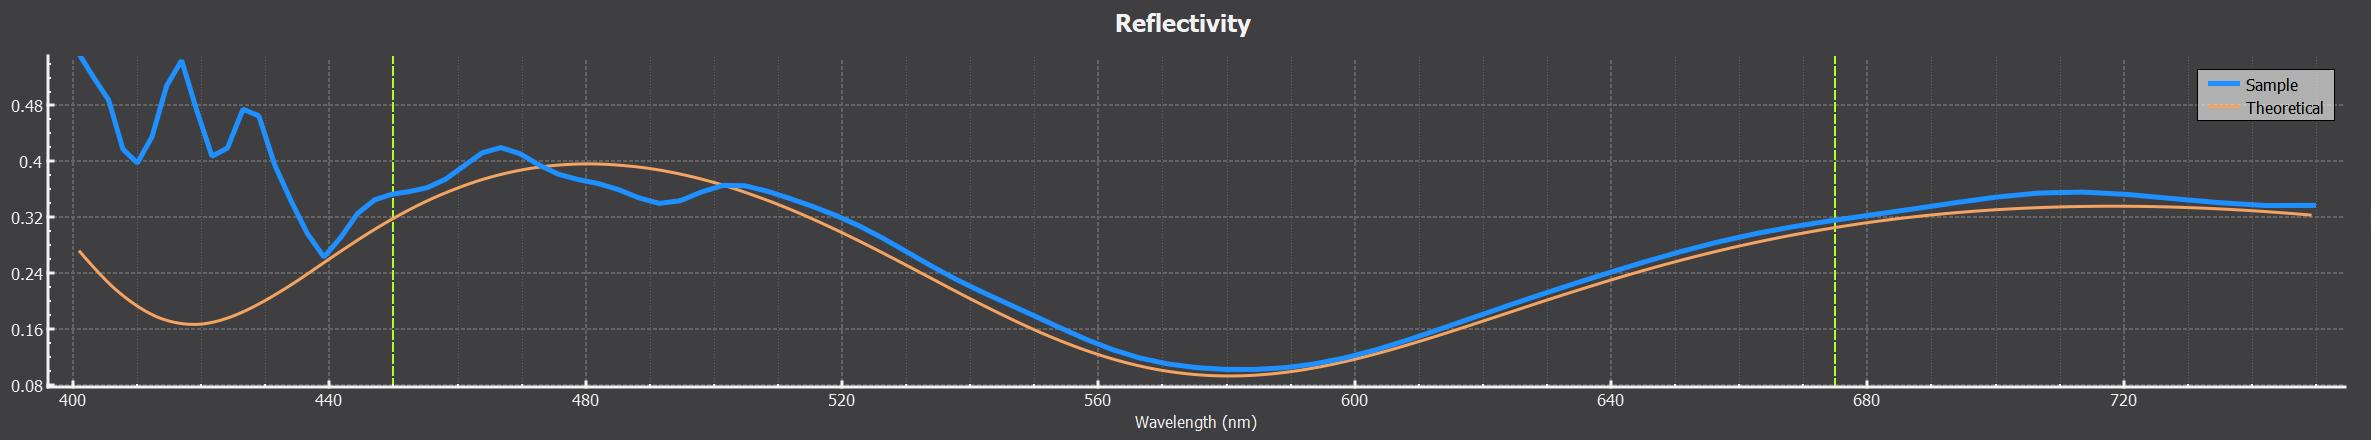 Reflectometry thin Film analysis